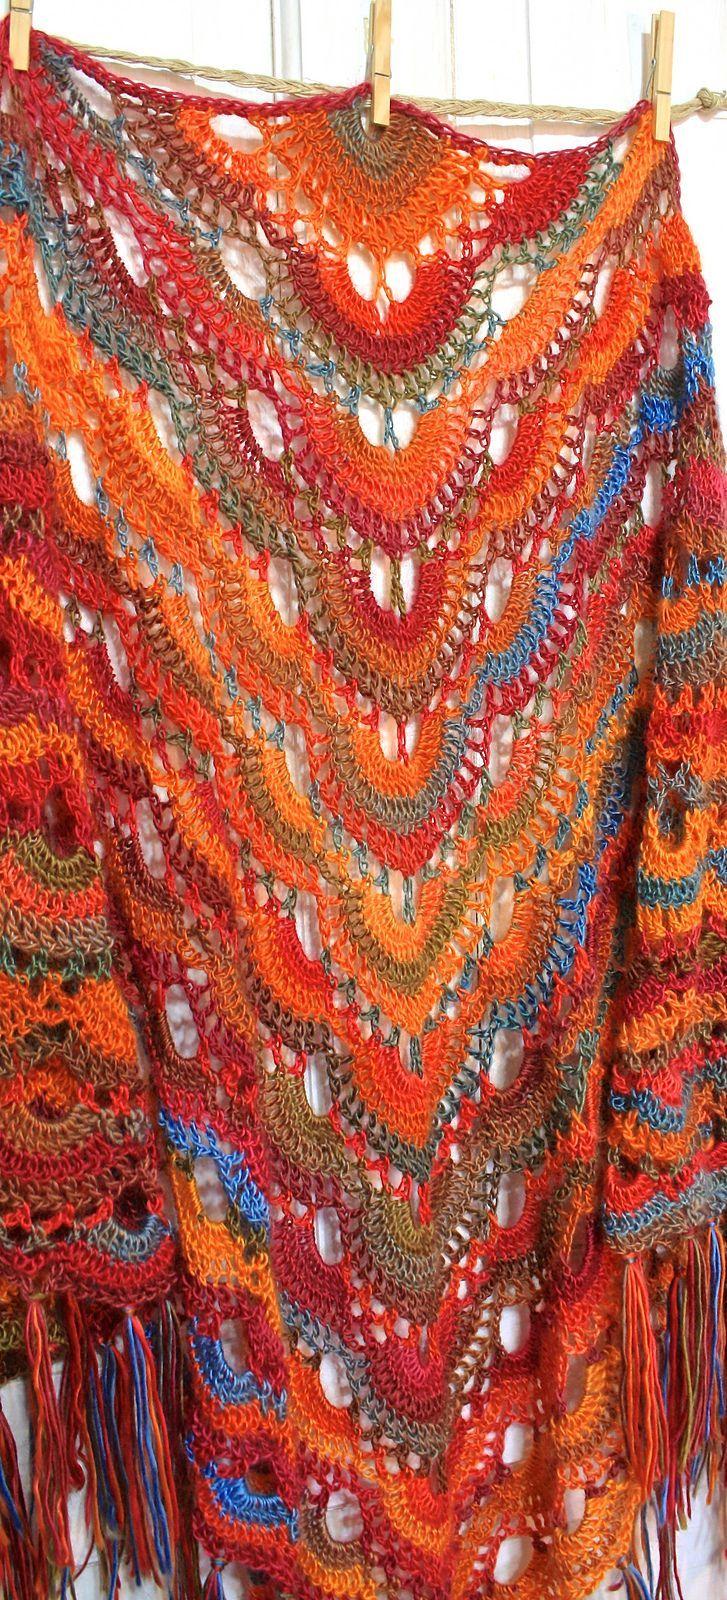 Virus Crochet Shawl Video Tutorial By Julia Marquardt - Left-Handed ...